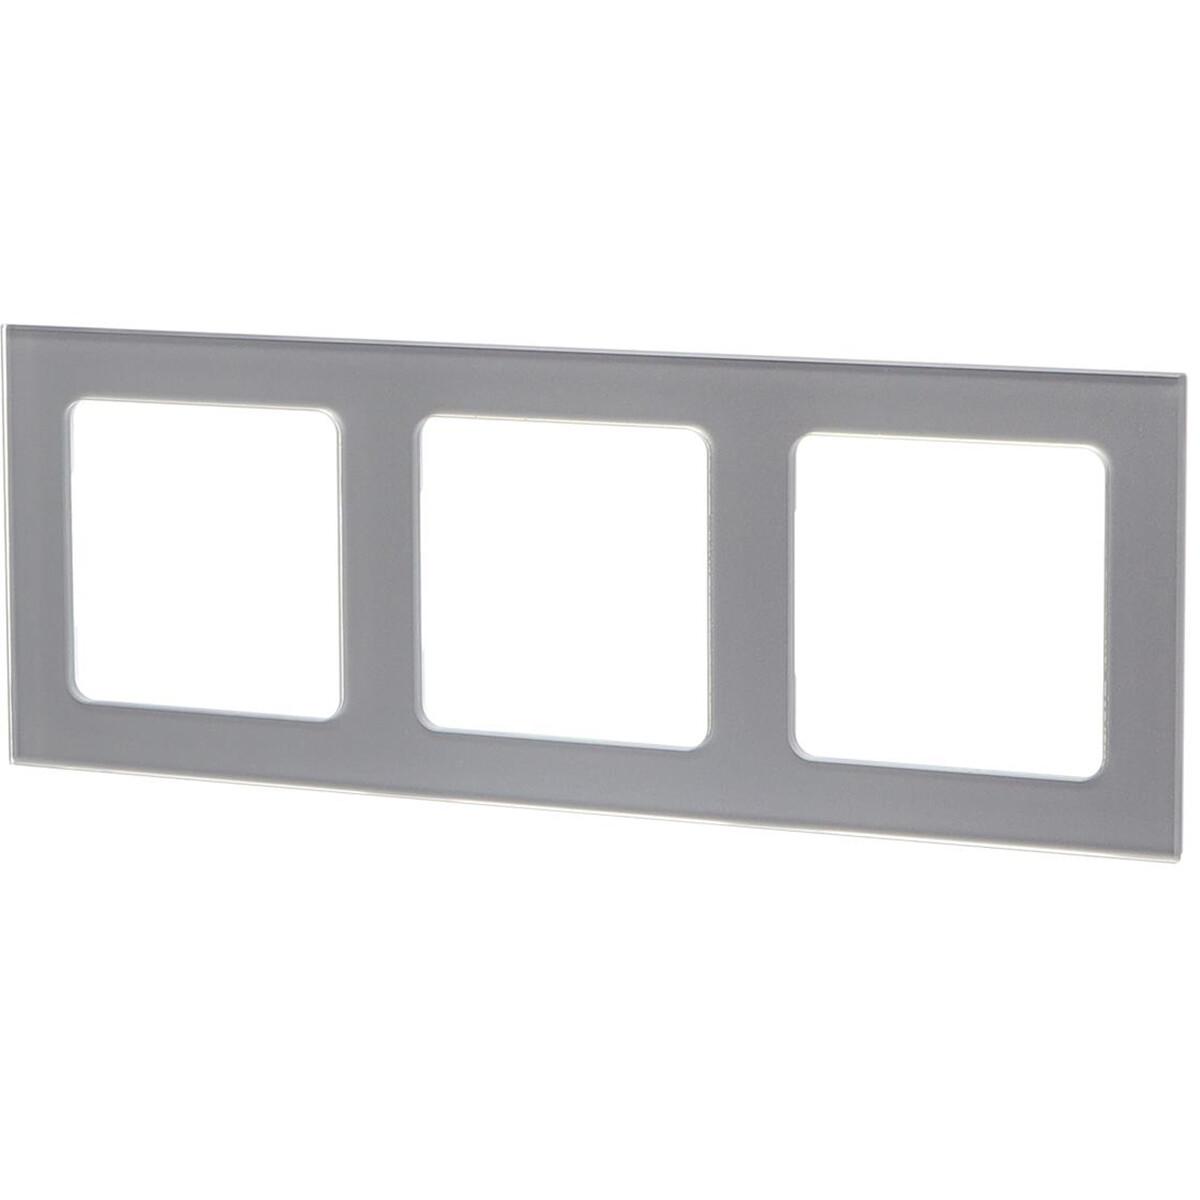 Afdekraam - Aigi Jura - 3-voudig - Vierkant - Glas - Zilver